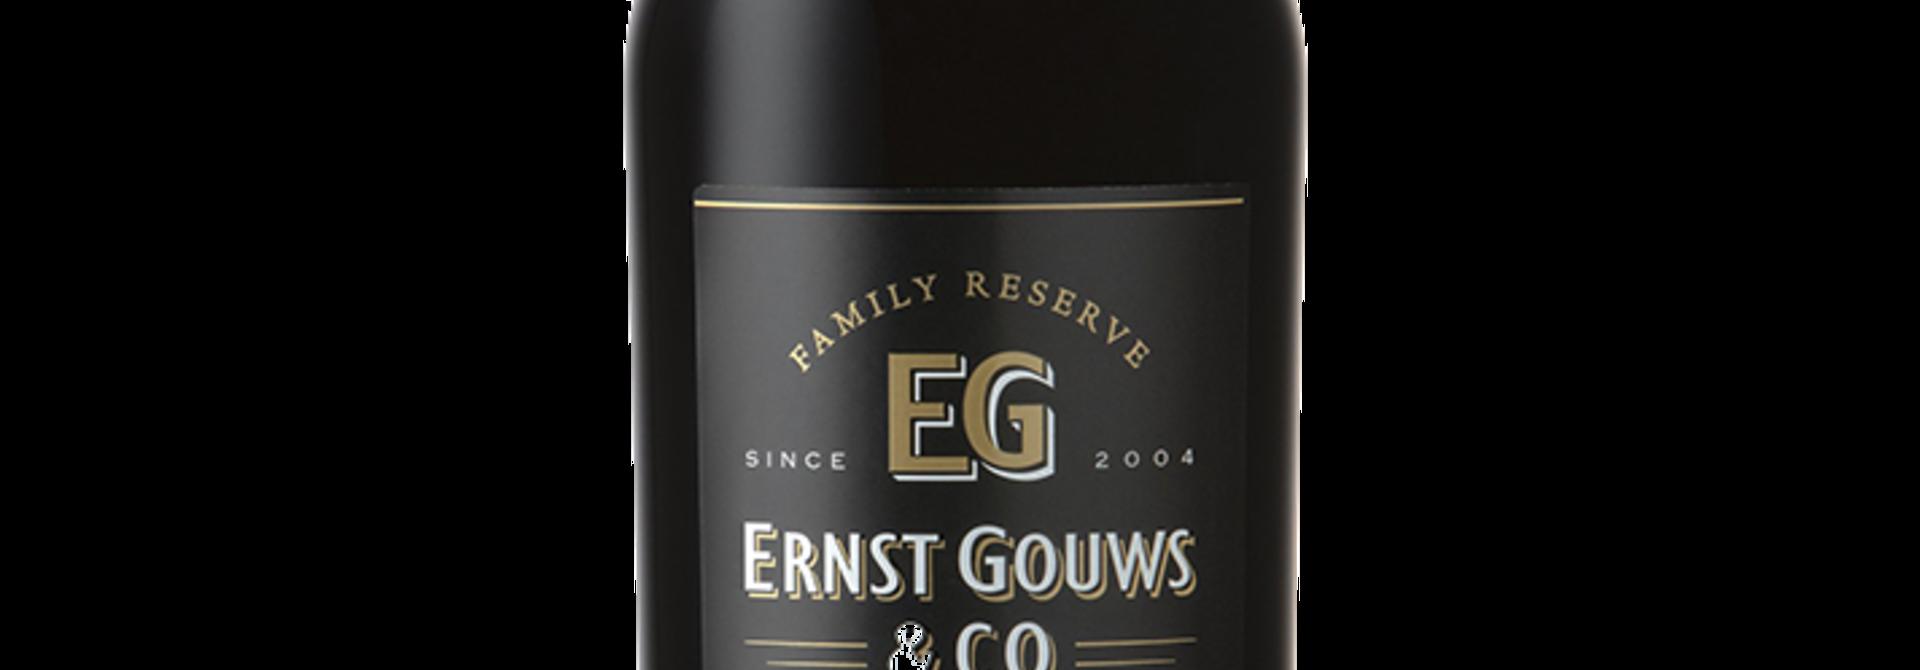 Ernst Gouws Cabernet Sauvignon Family Reserve 2016